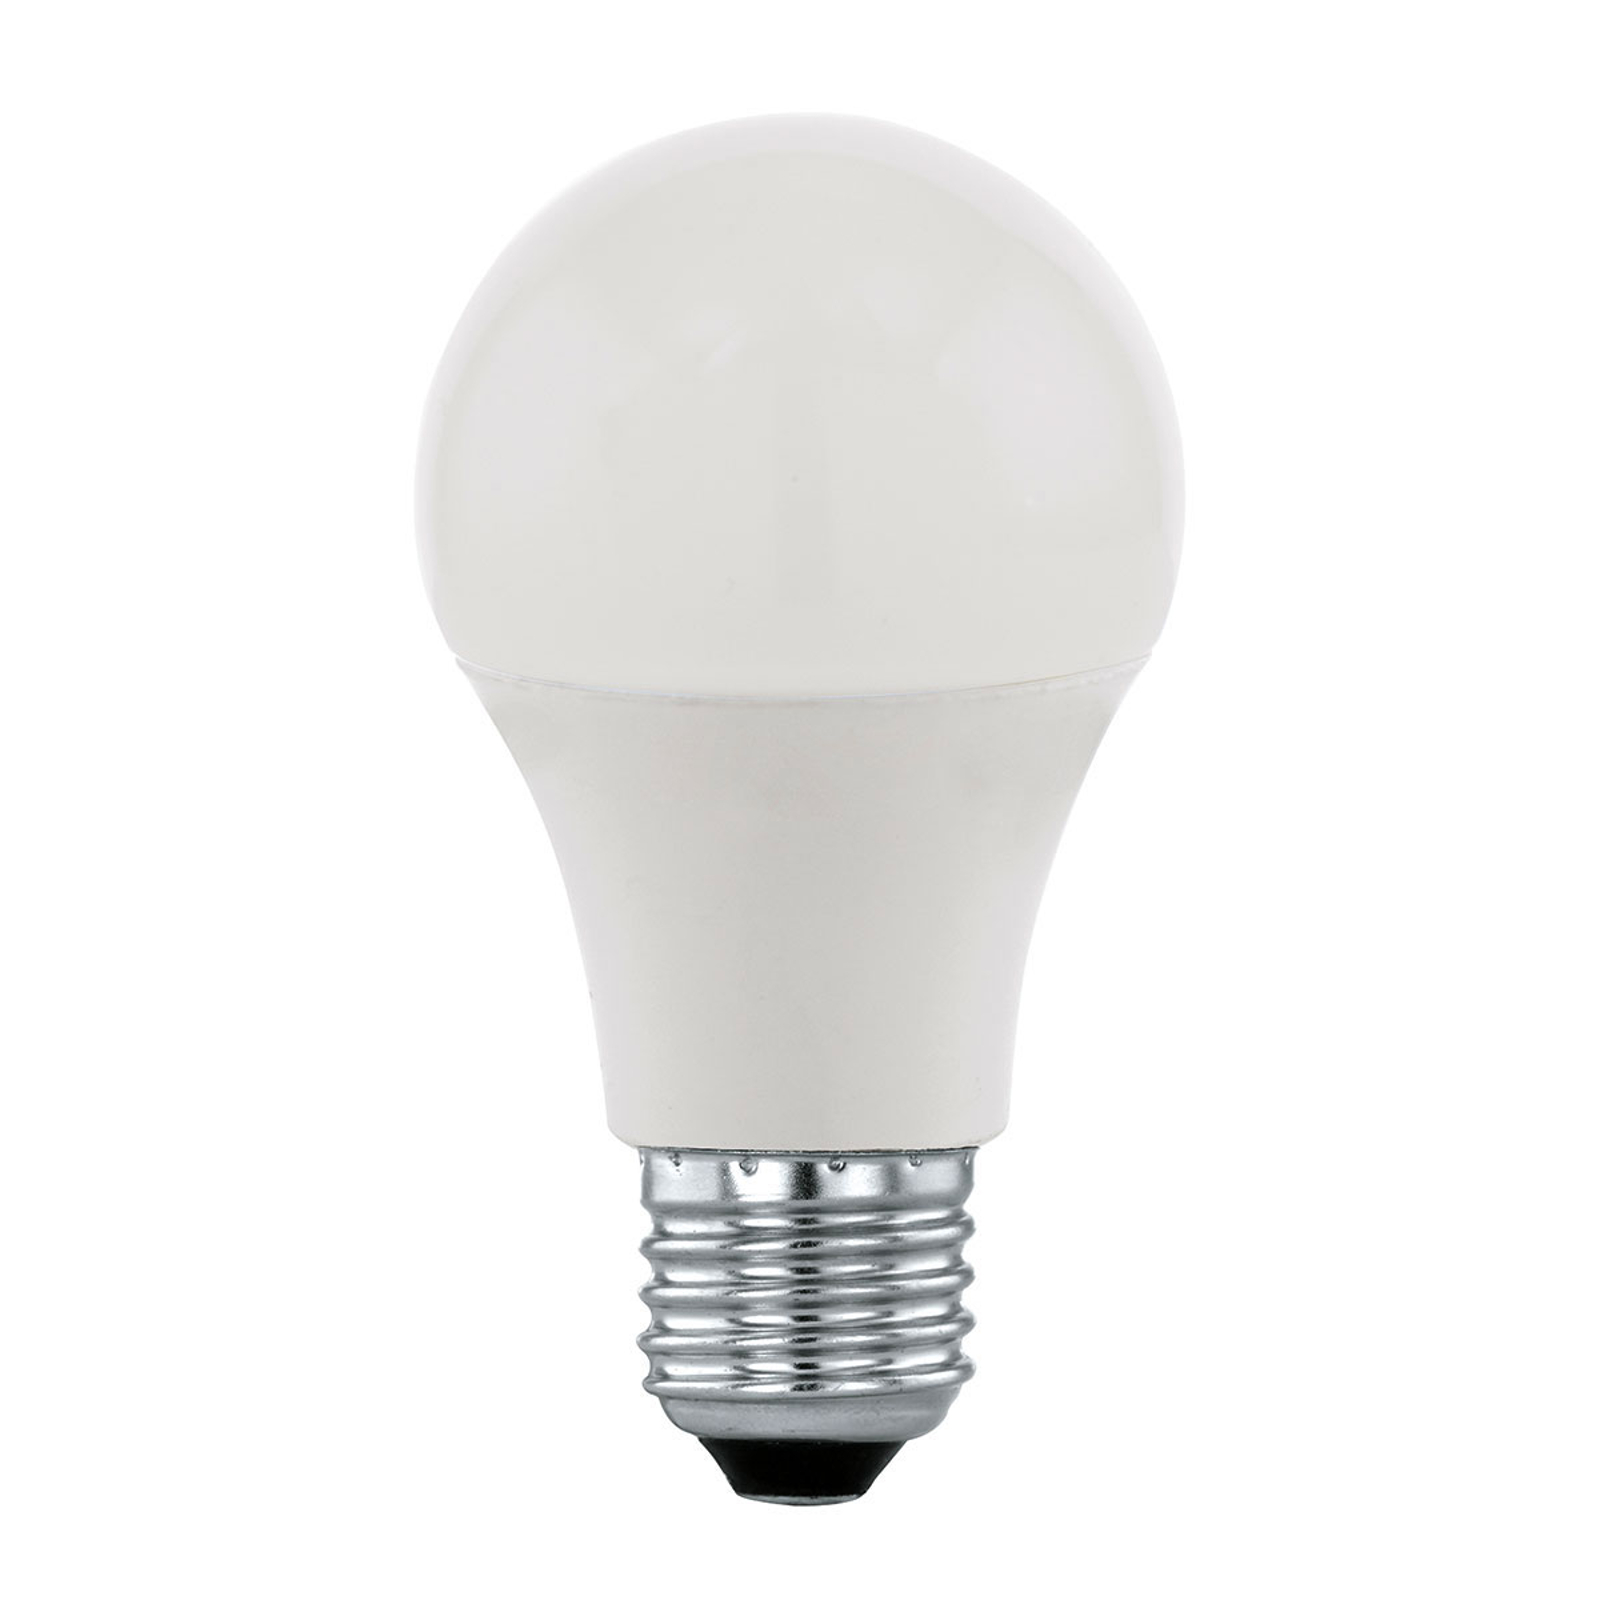 EGLO connect E27 9W LED blanc chaud